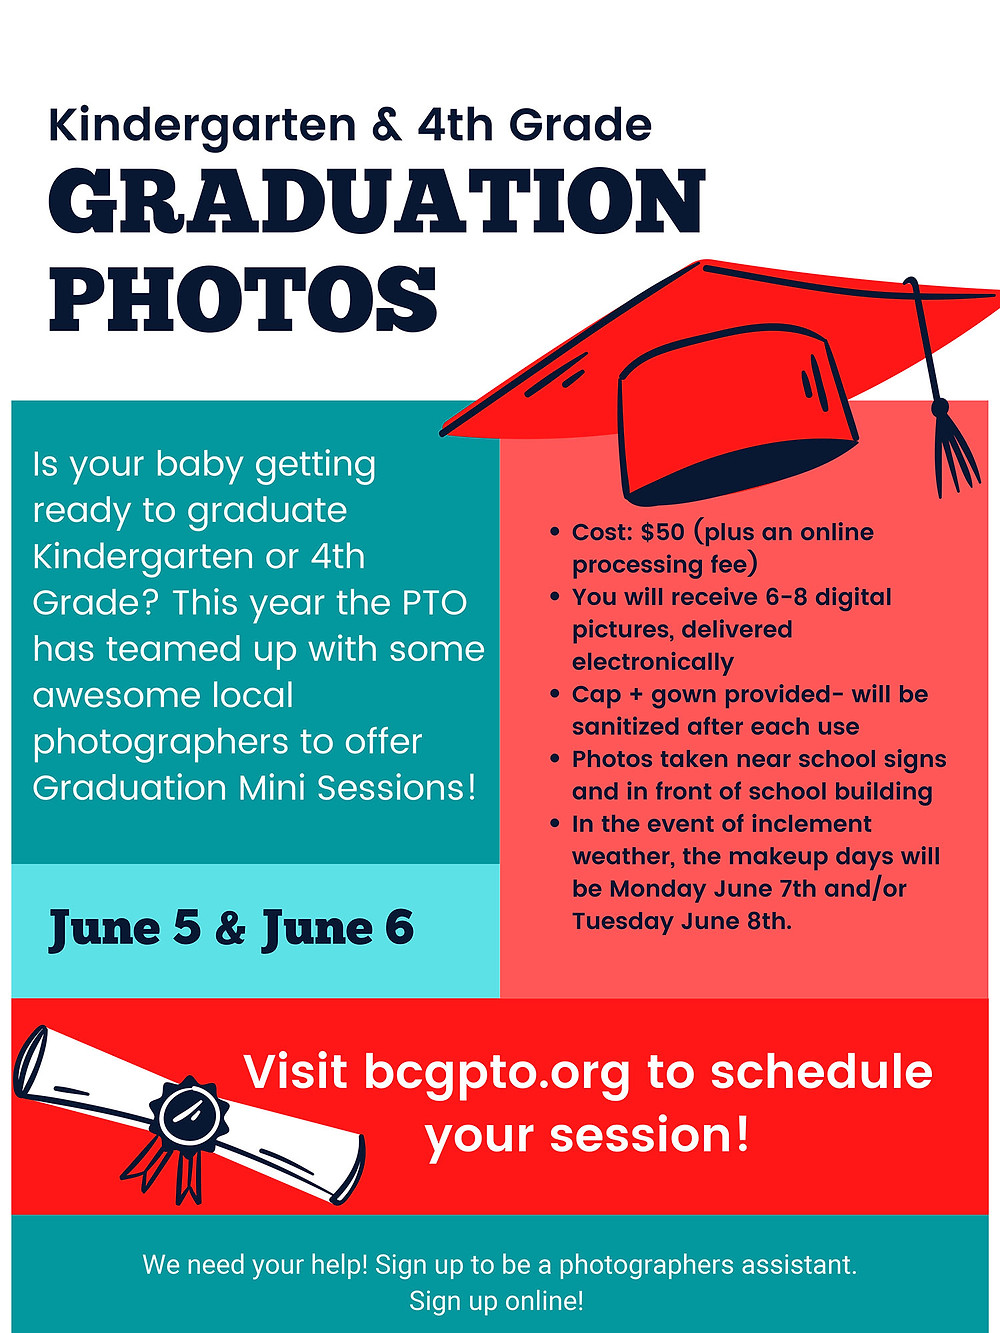 Kindergarten & 4th Grade Graduation Photo flyer